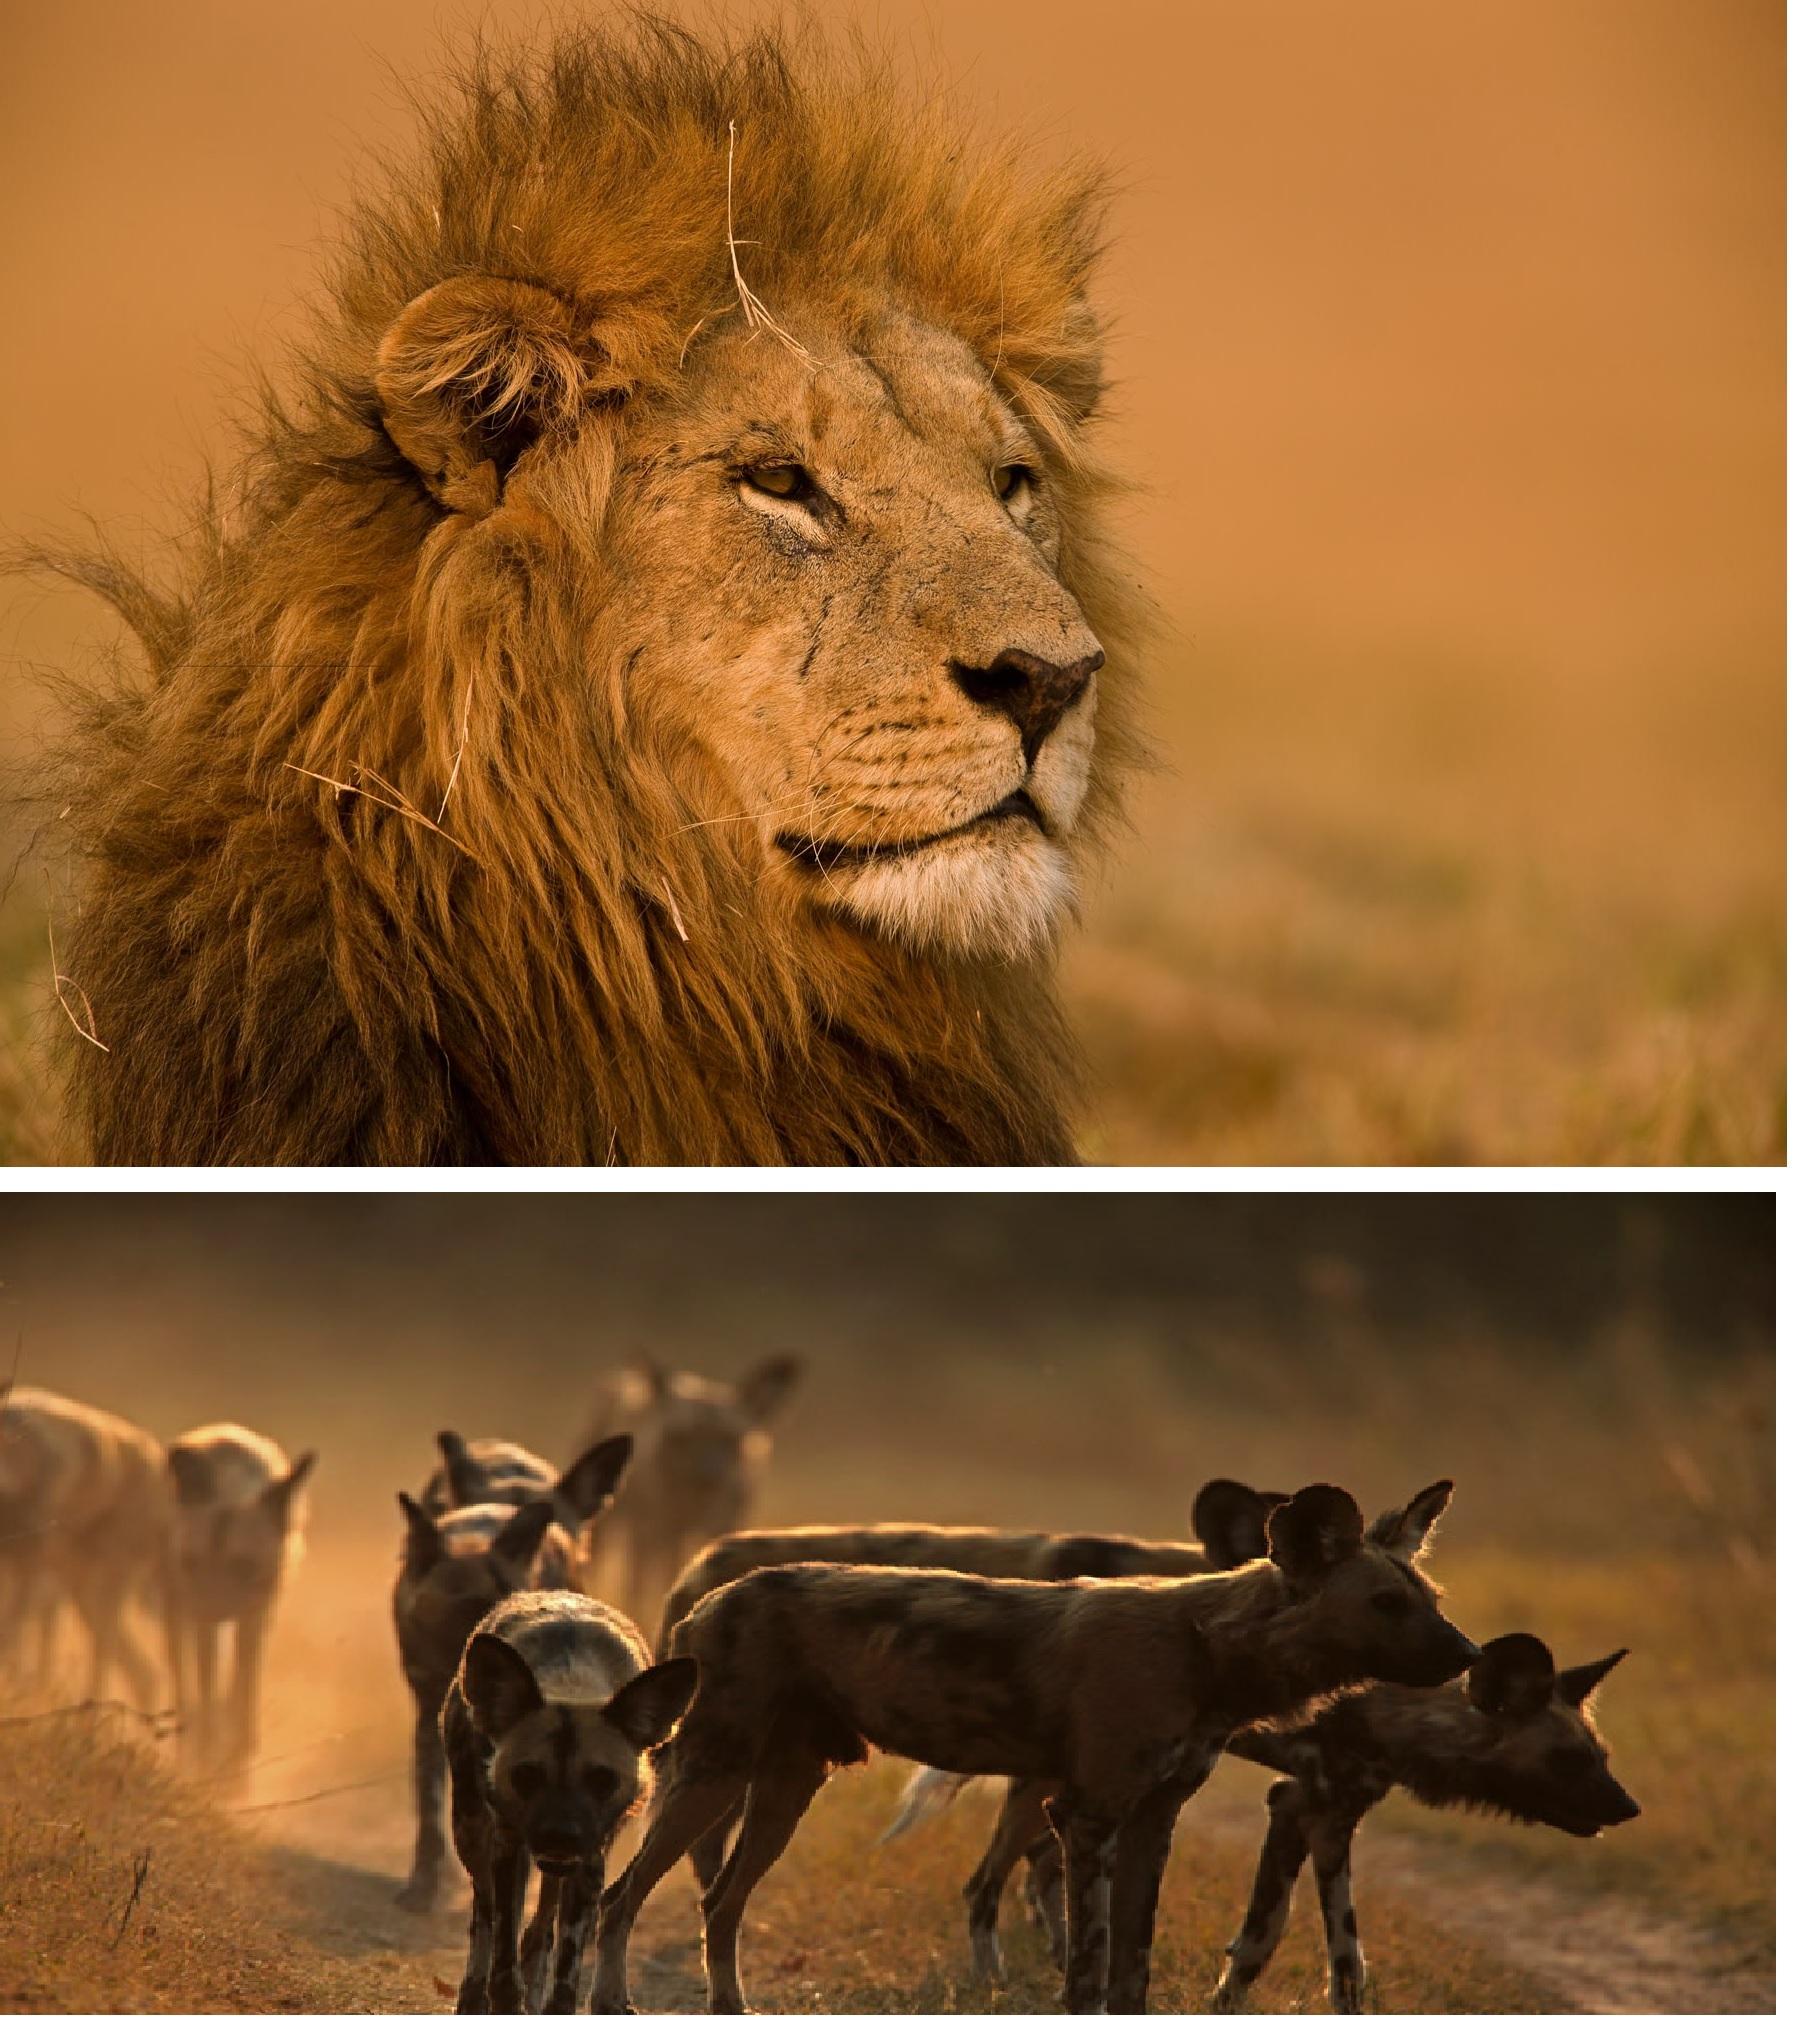 lion-wild-dog-photo-great-plains